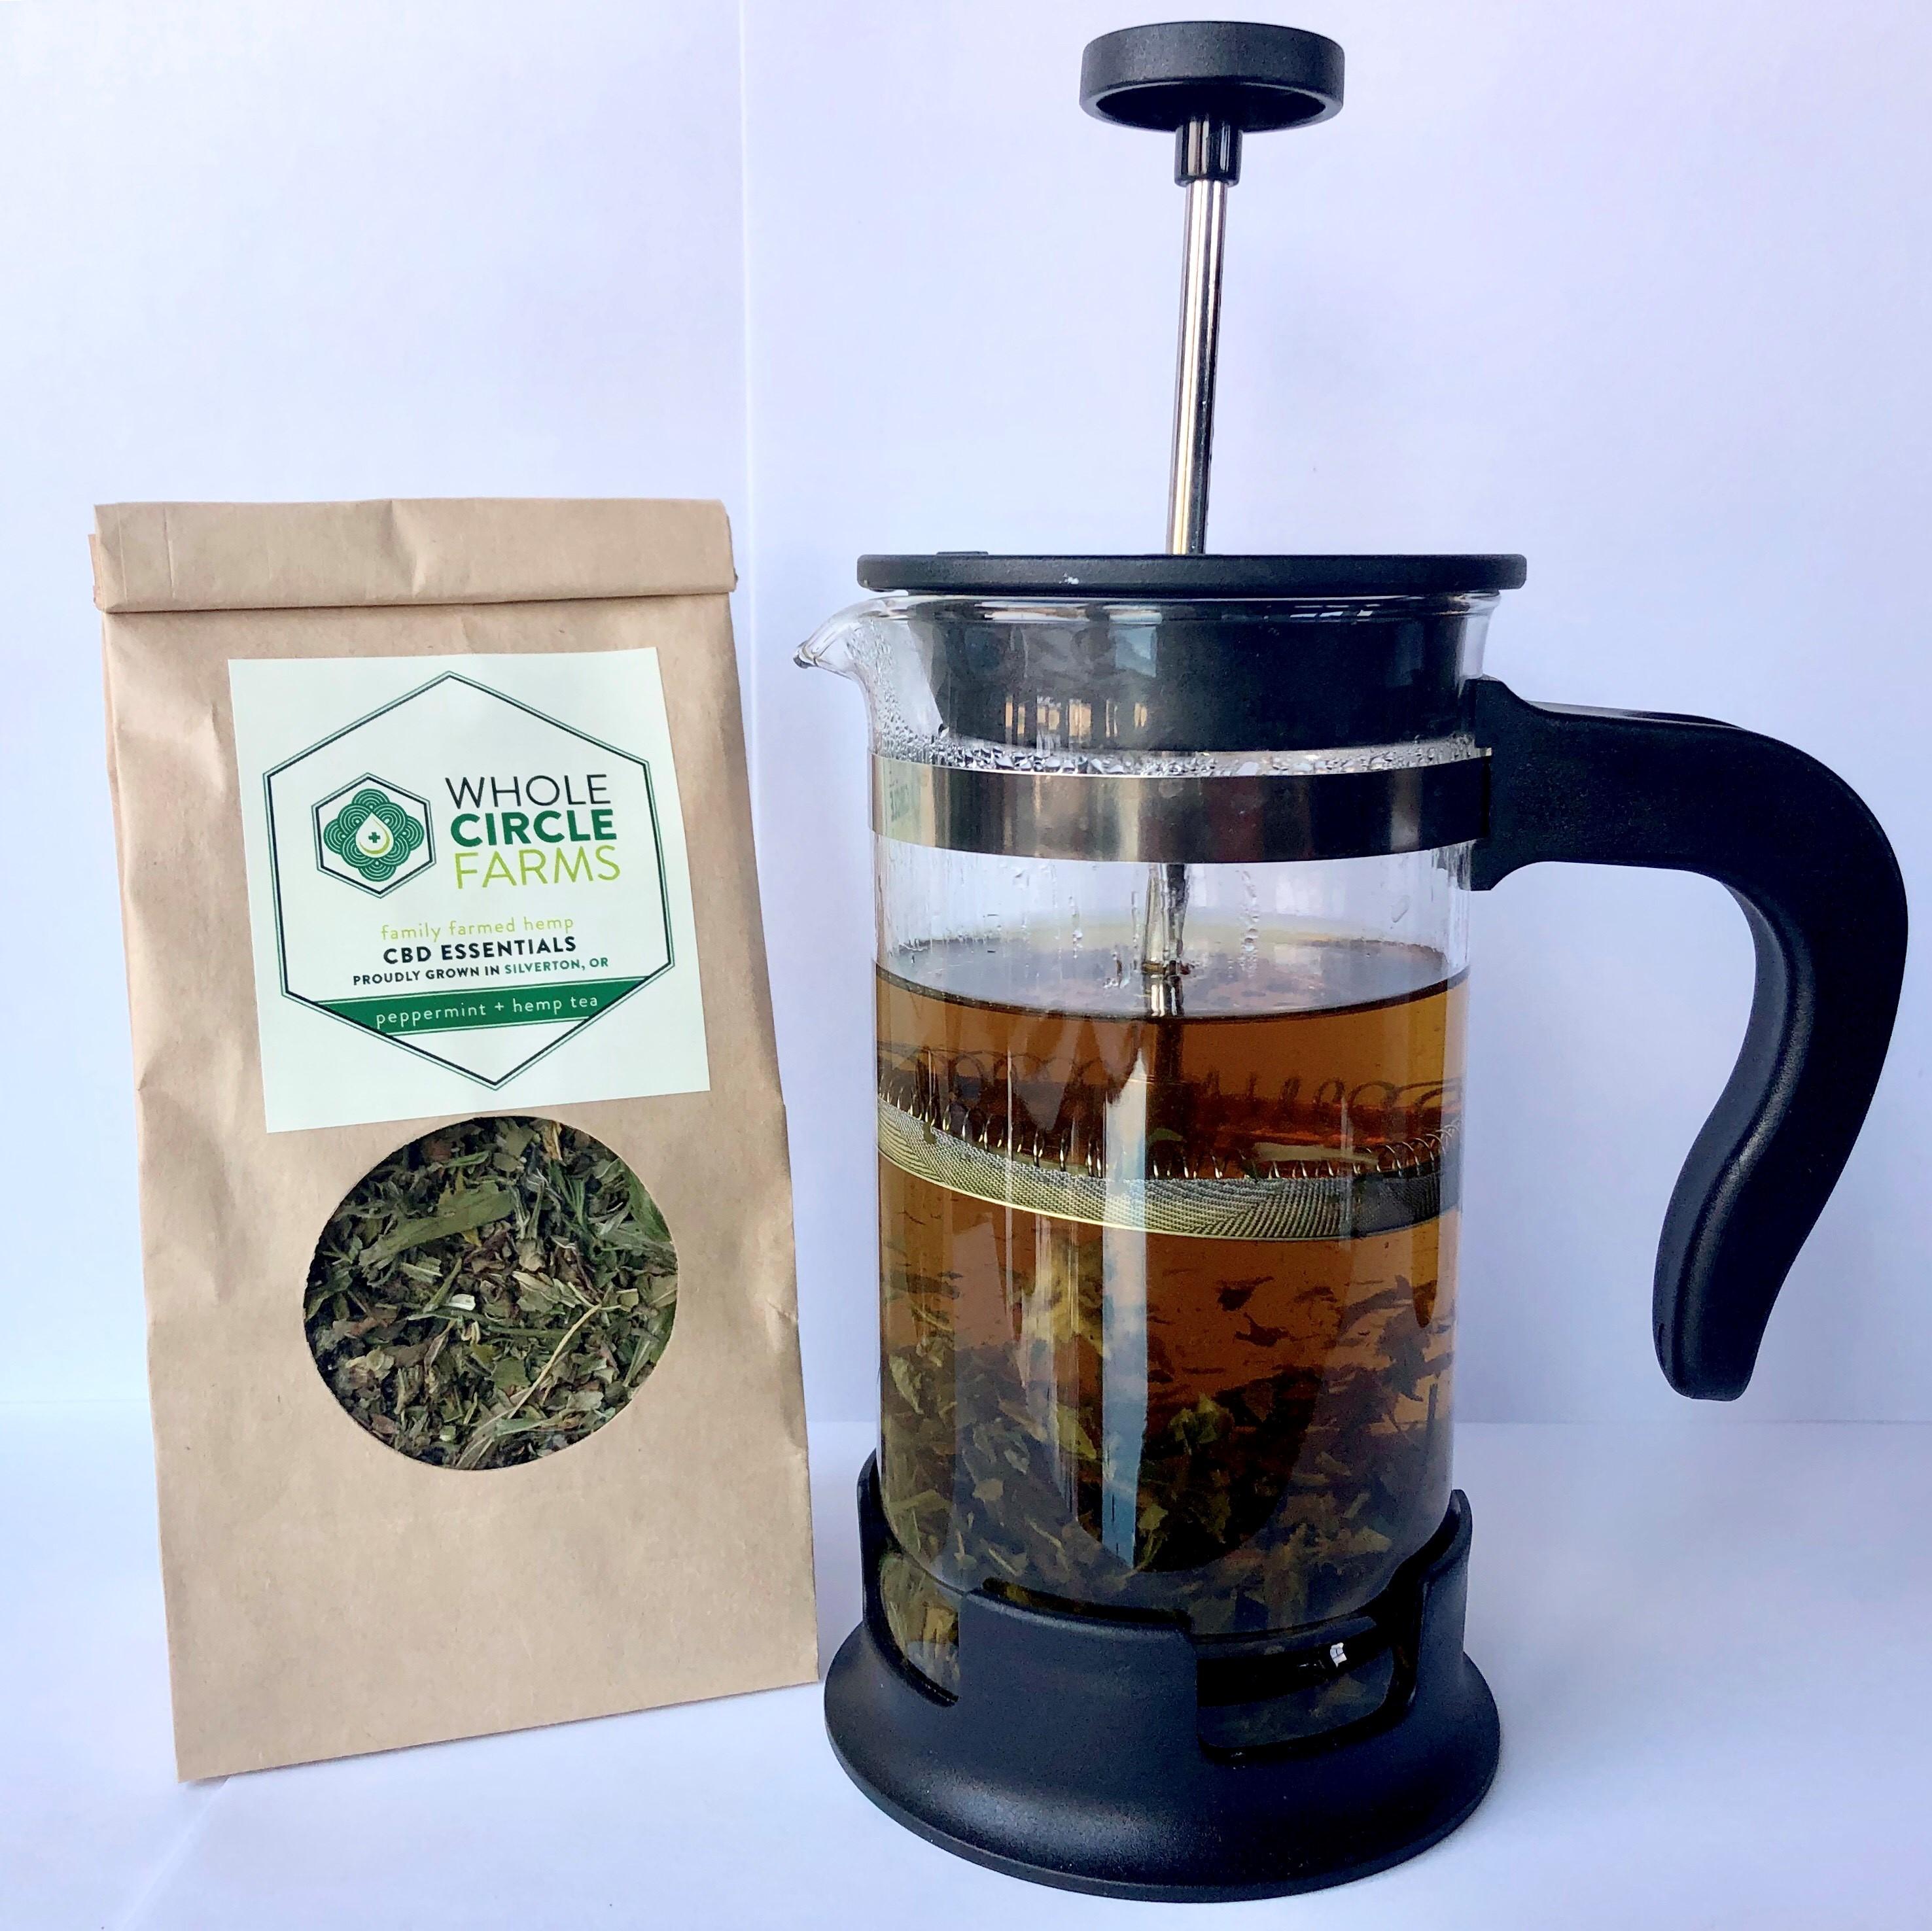 Peppermint + Hemp Tea